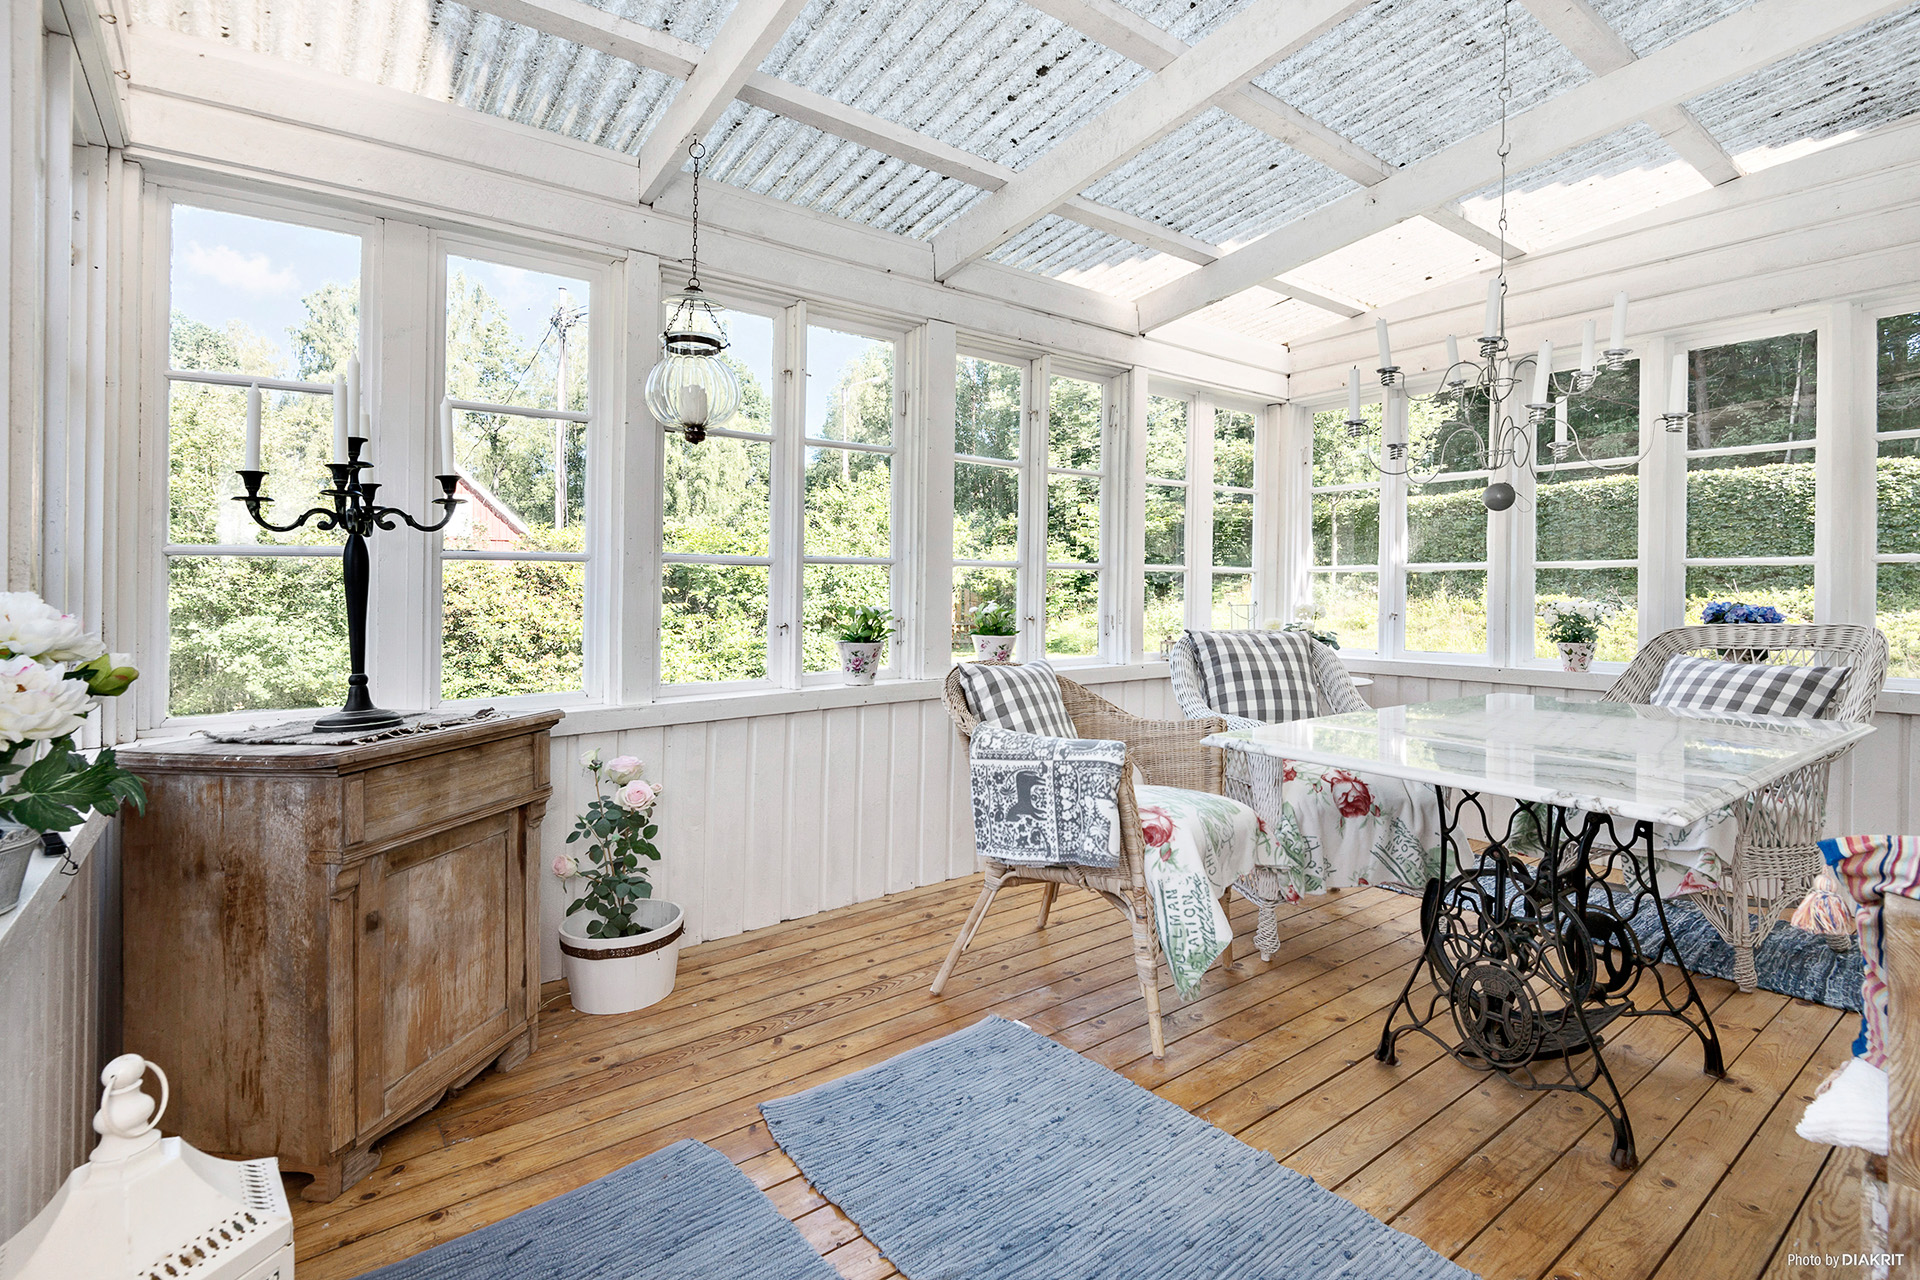 Inglasad veranda!